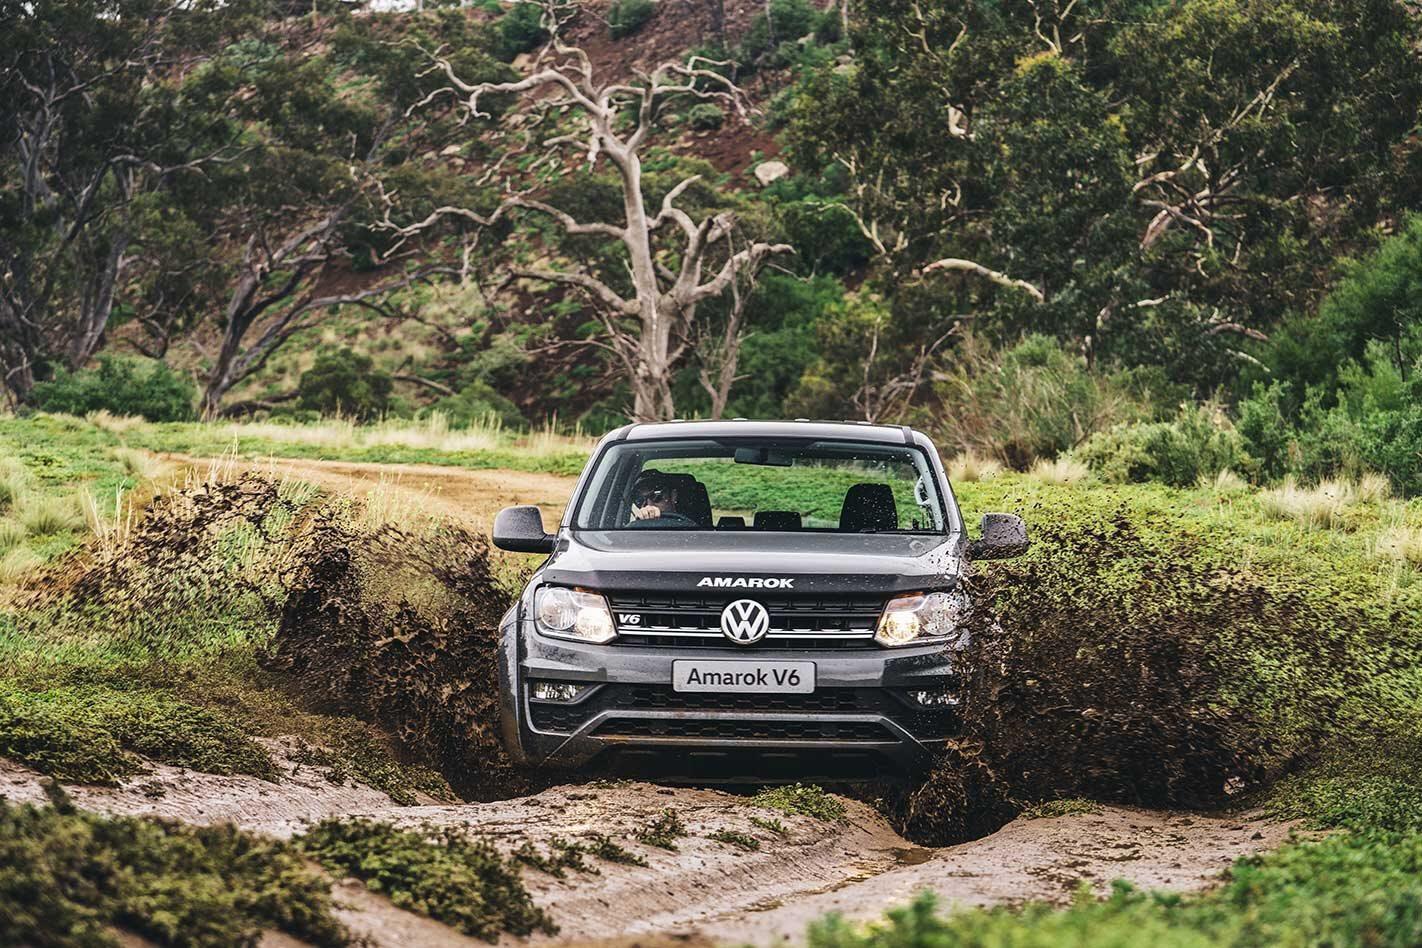 2020 Volkswagen Amarok V6 manual off-road